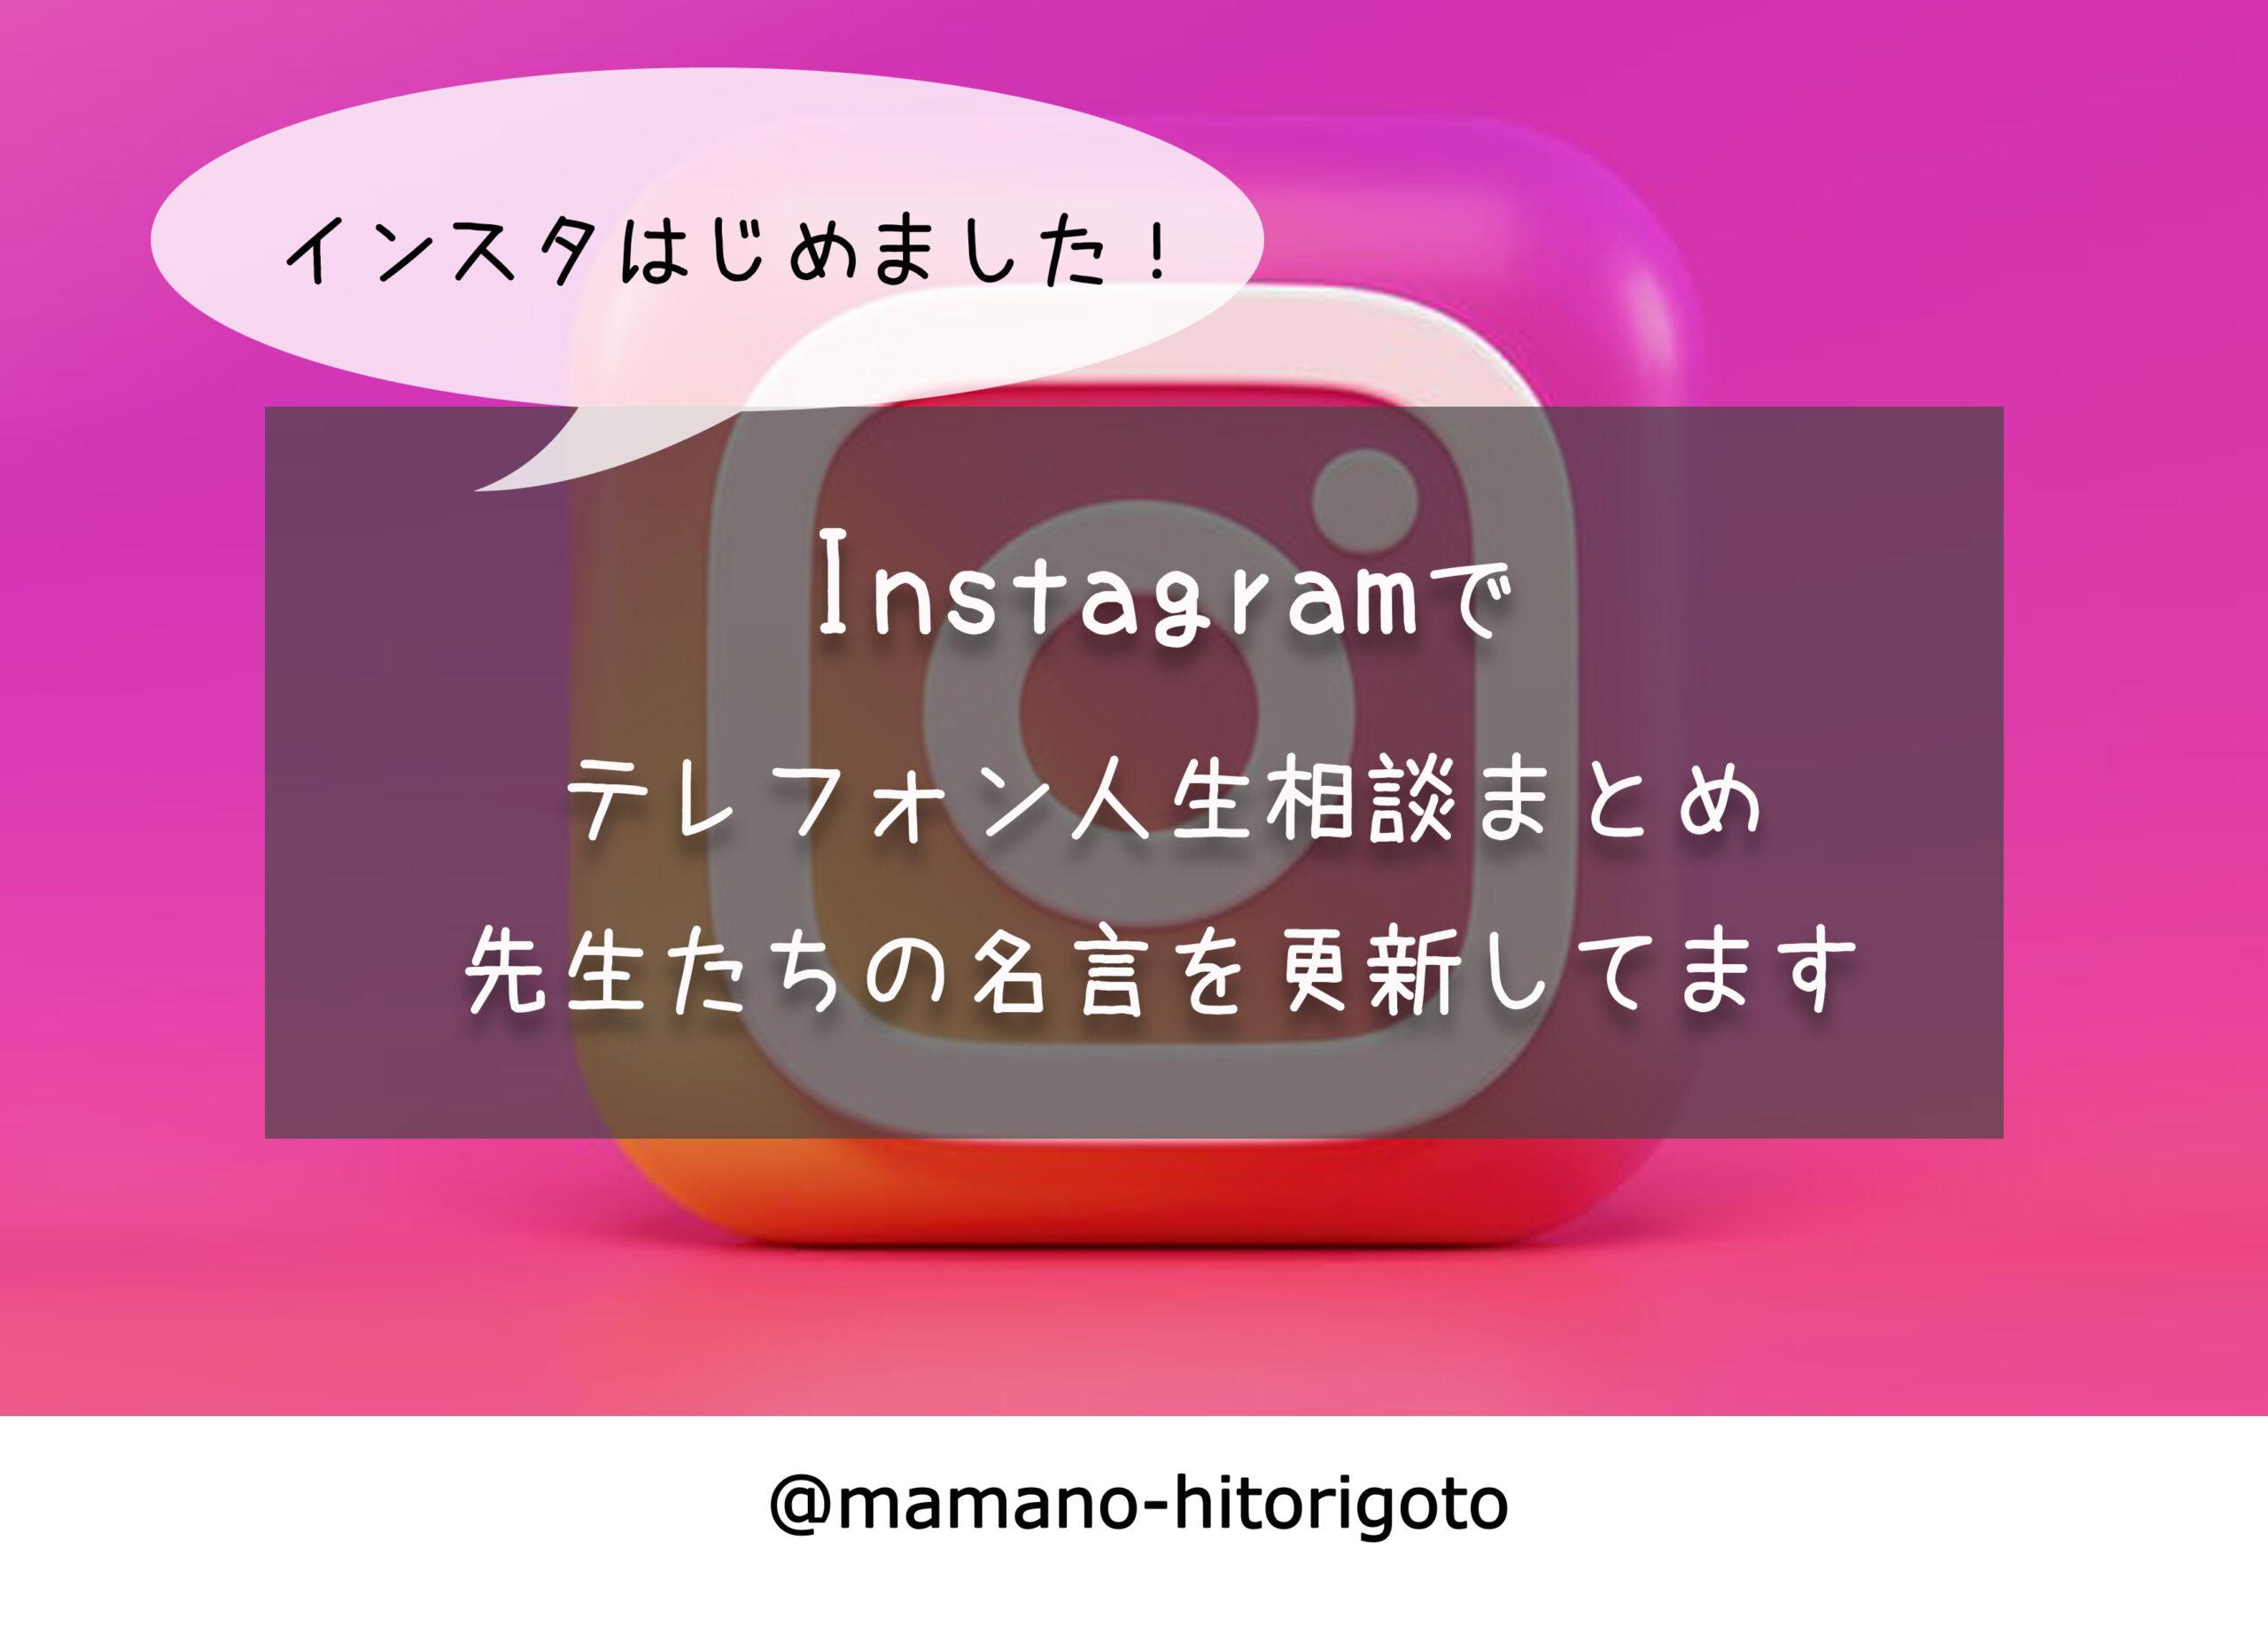 Instagram始めました!テレフォン人生相談まとめ・先生たちの名言アカウント